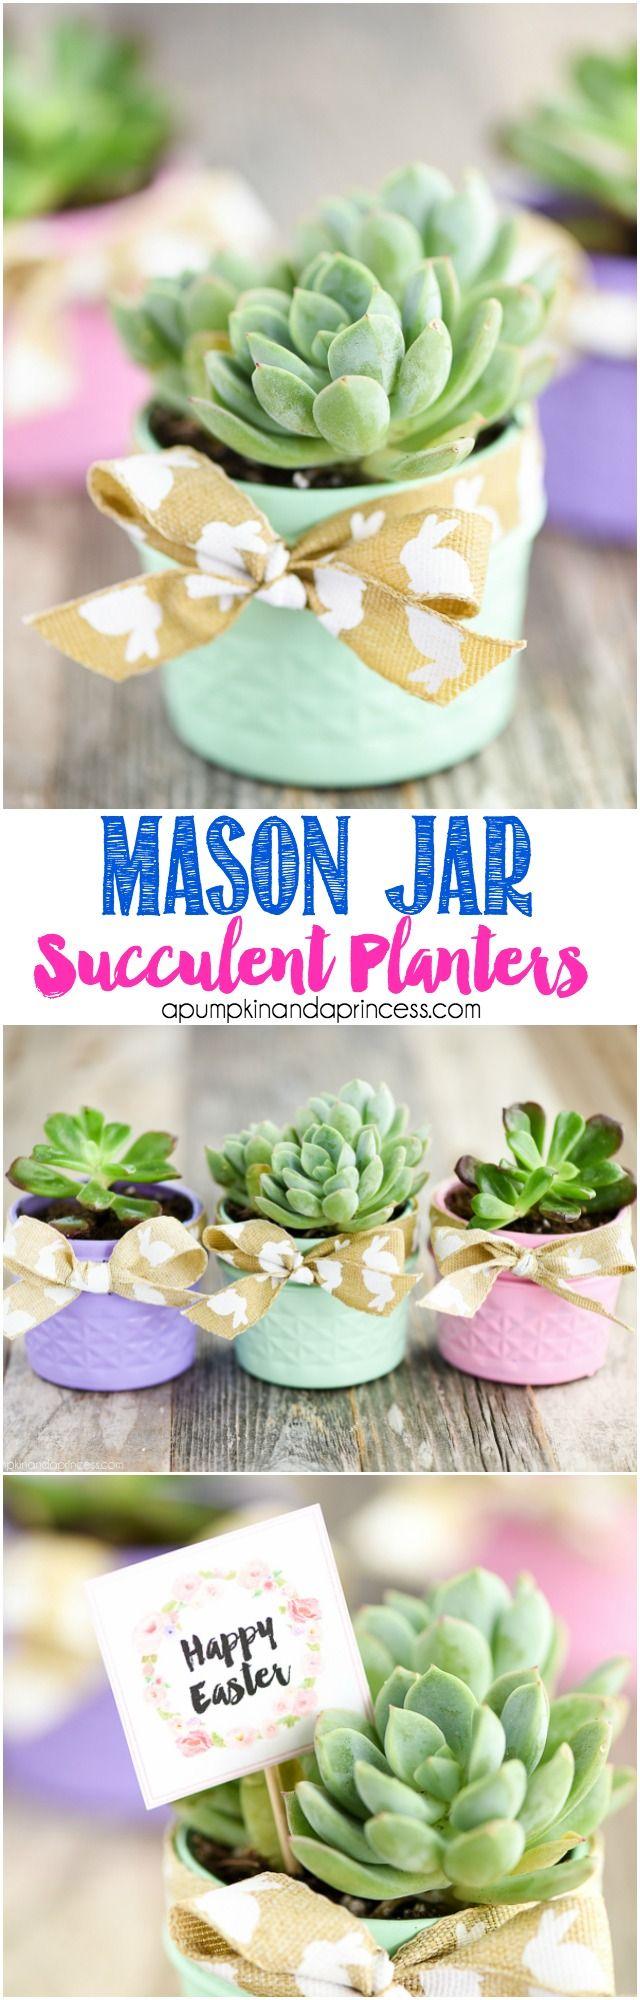 Photo of Mason Jar Succulent Planters